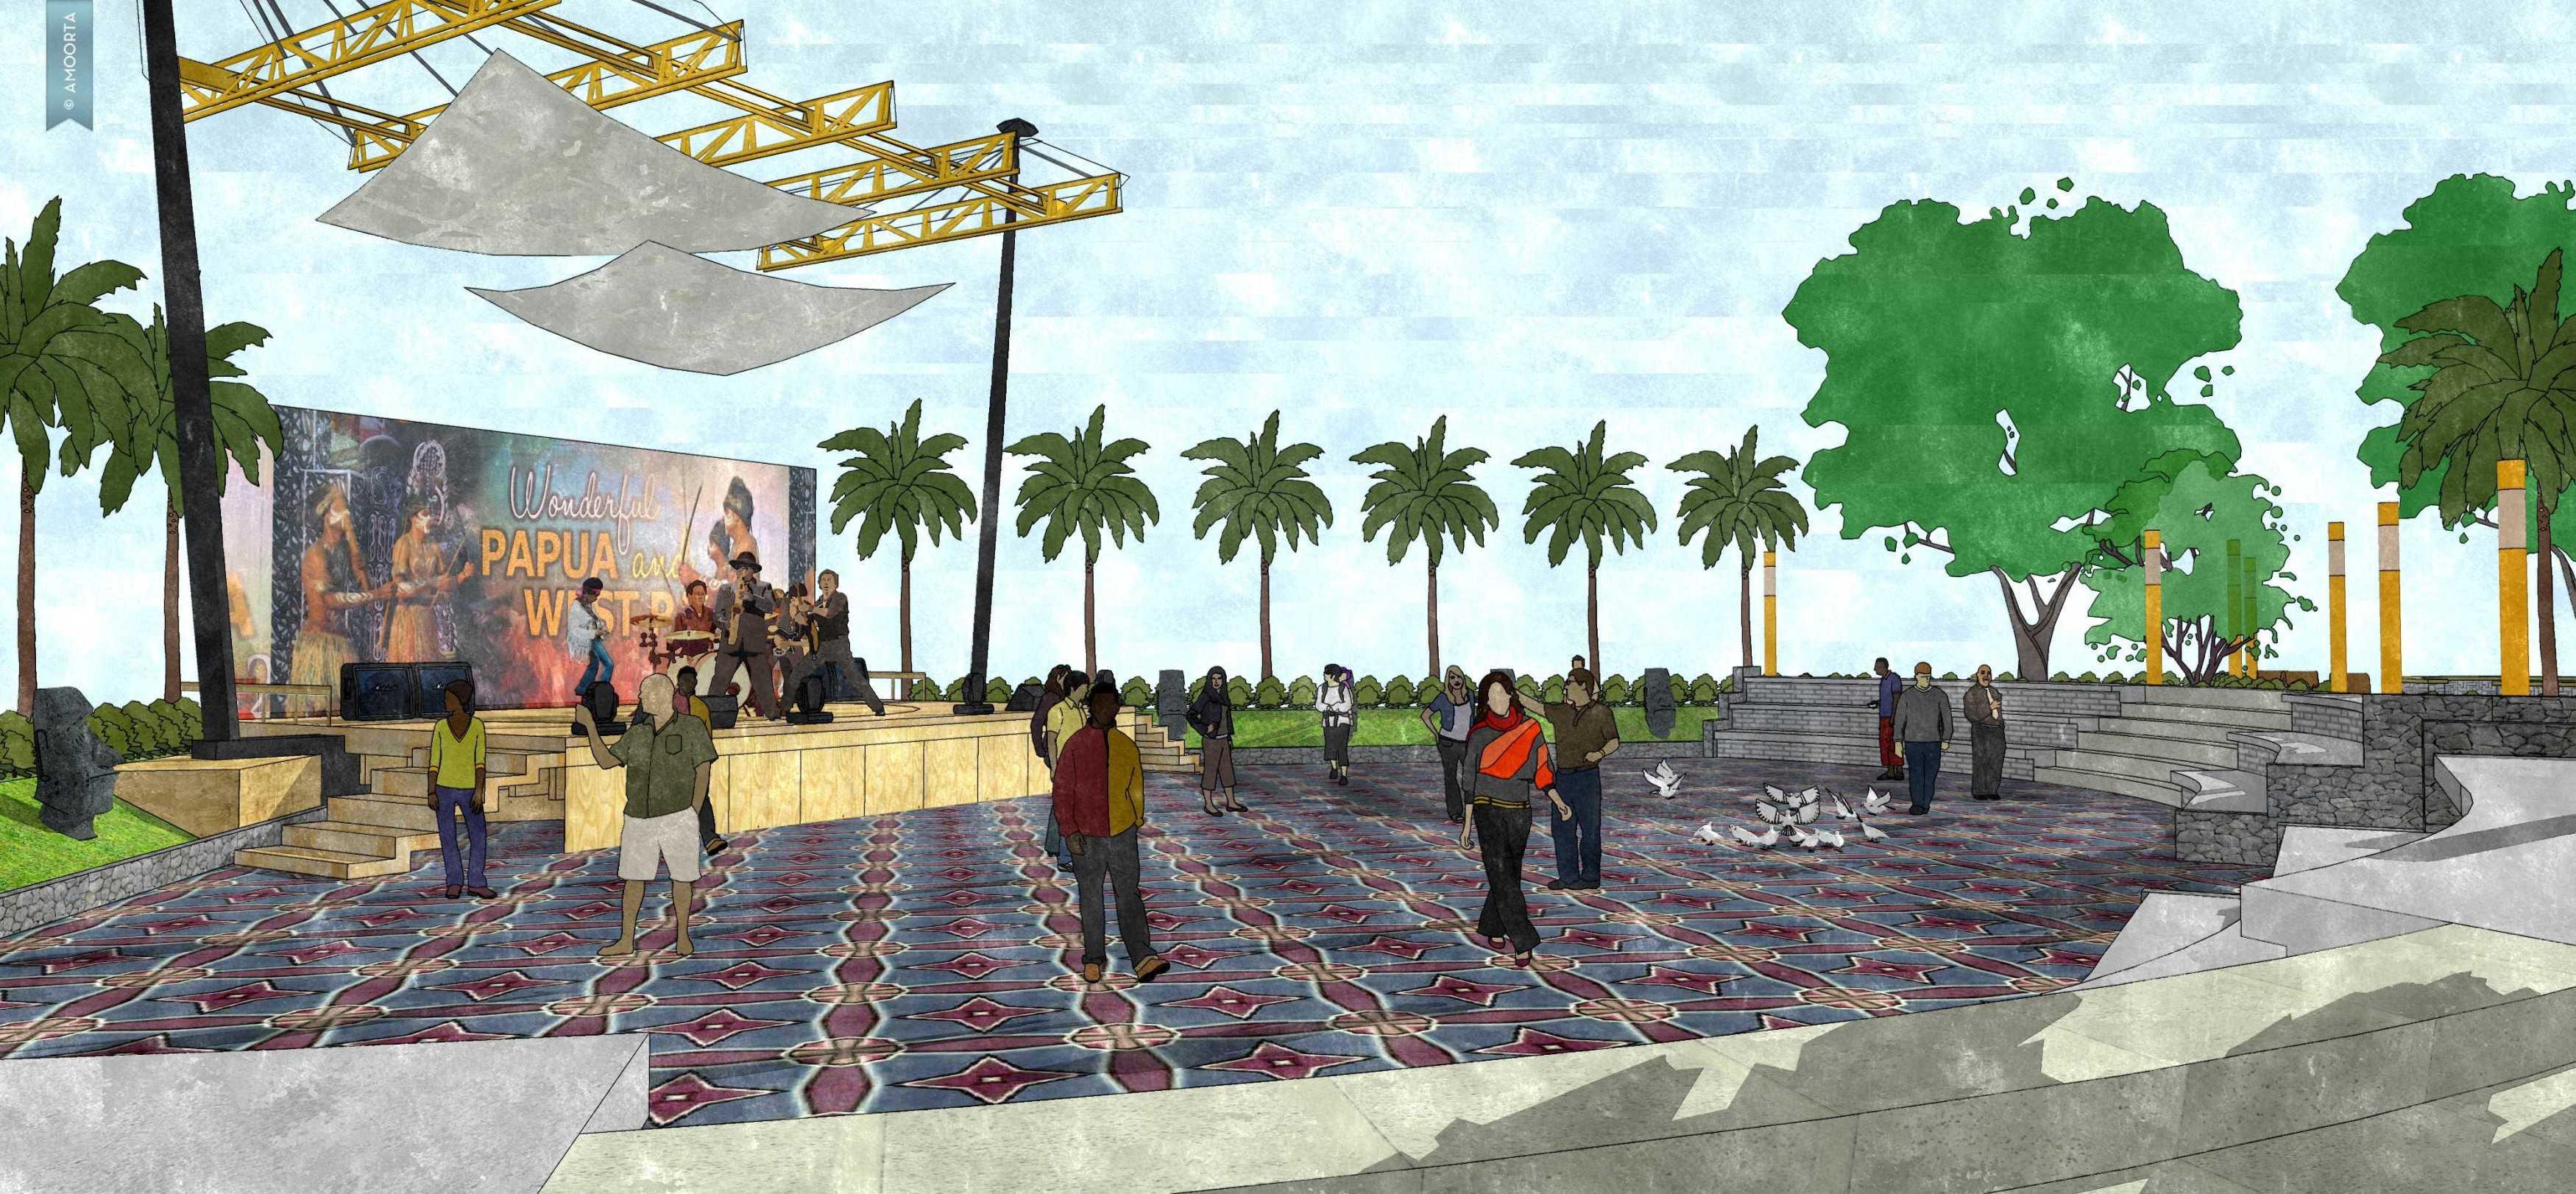 Amorta Design Studio Taman Kota Wasior Wasior Papua Wasior Papua 20130128-Taman-Budaya-Papua18 Modern  29410